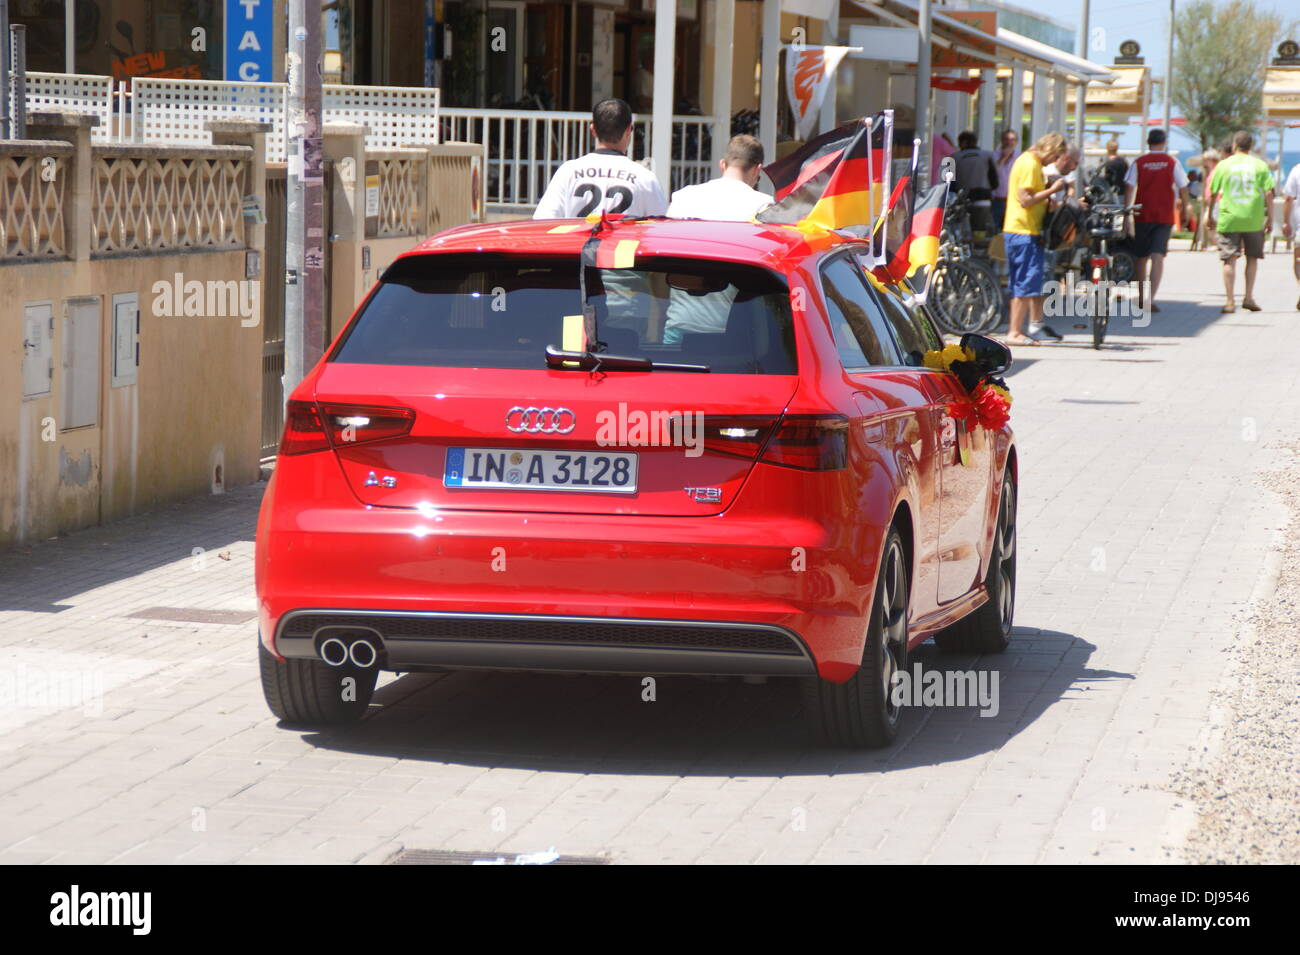 German Car Maker Audi Filming A Commercial For New A At - Audi car maker